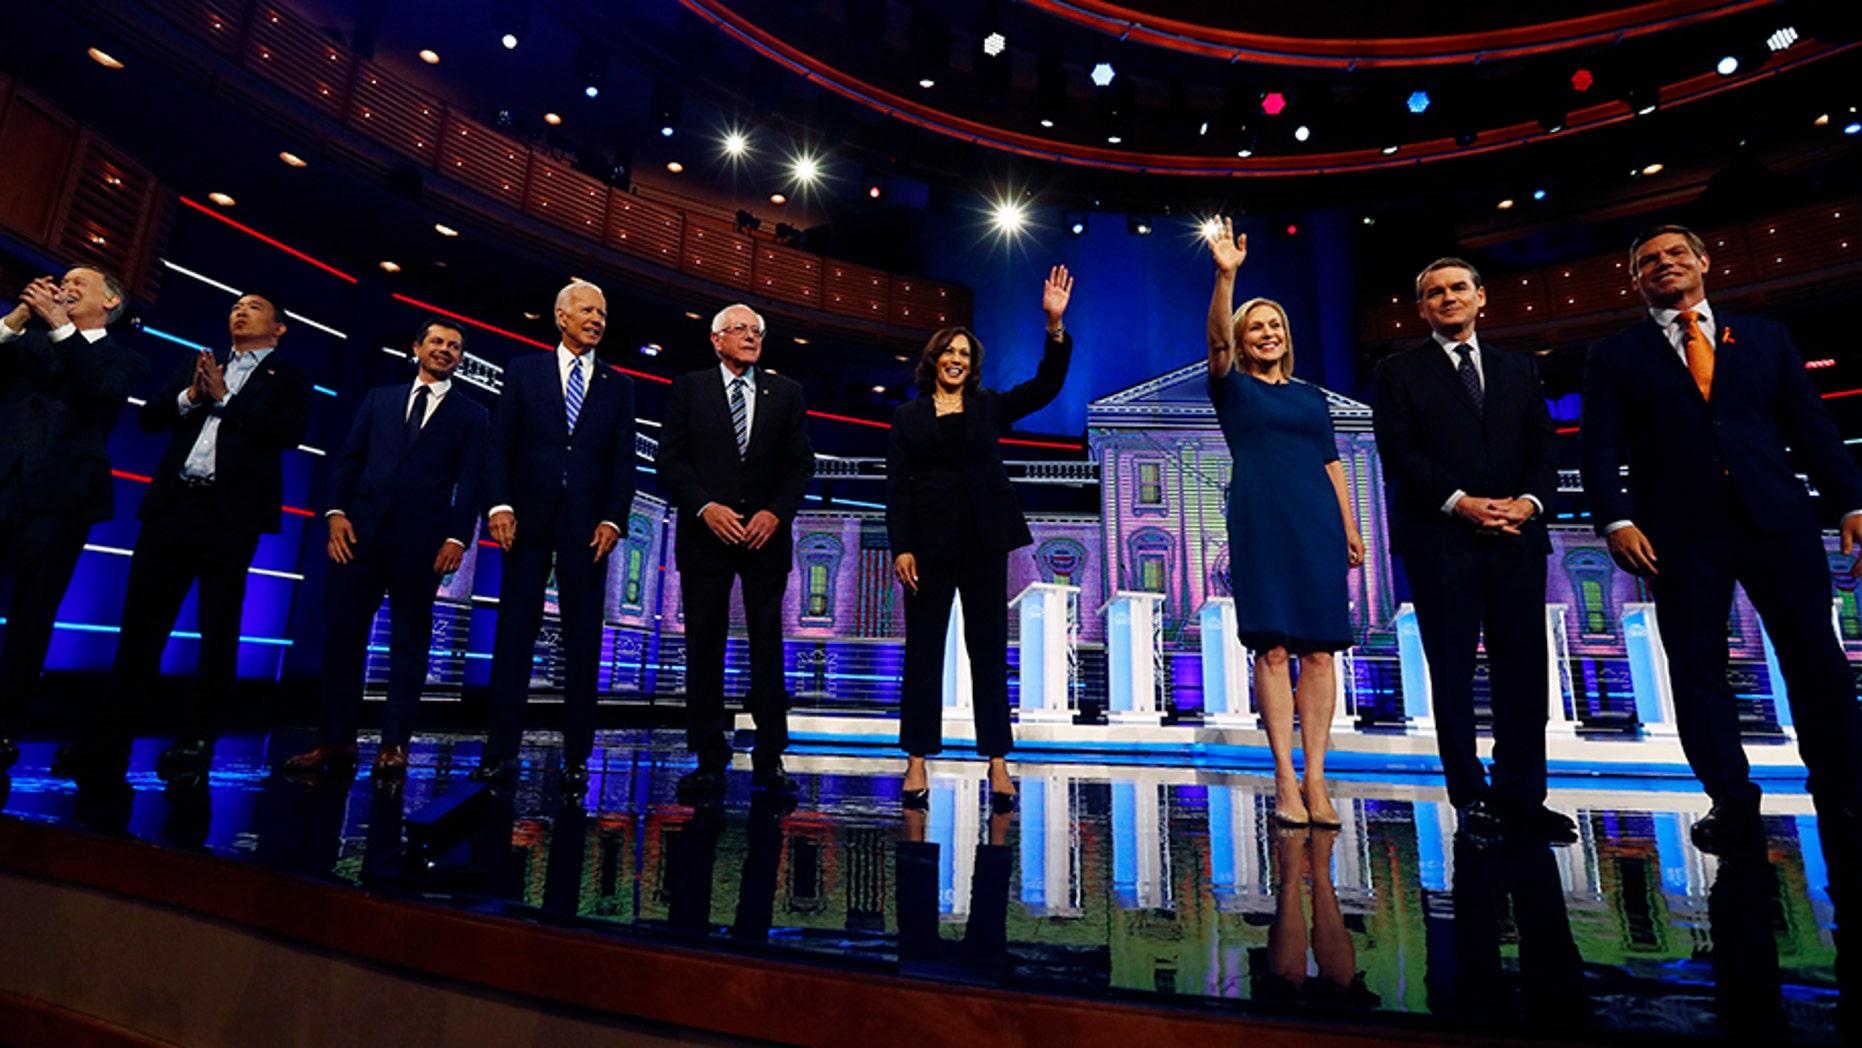 Democratic presidential candidates, from left, former Colorado Gov. John Hickenlooper, entrepreneur Andrew Yang, South Bend, Ind., Mayor Pete Buttigieg, former Vice-President Joe Biden, Sen. Bernie Sanders, I-Vt., Sen. Kamala Harris, D-Calif., Sen. Kristen Gillibrand, D-N.Y., former Colorado Sen. Michael Bennet and Rep. Eric Swalwell, D-Calif., assembled in Miami last months. (AP Photo/Brynn Anderson)